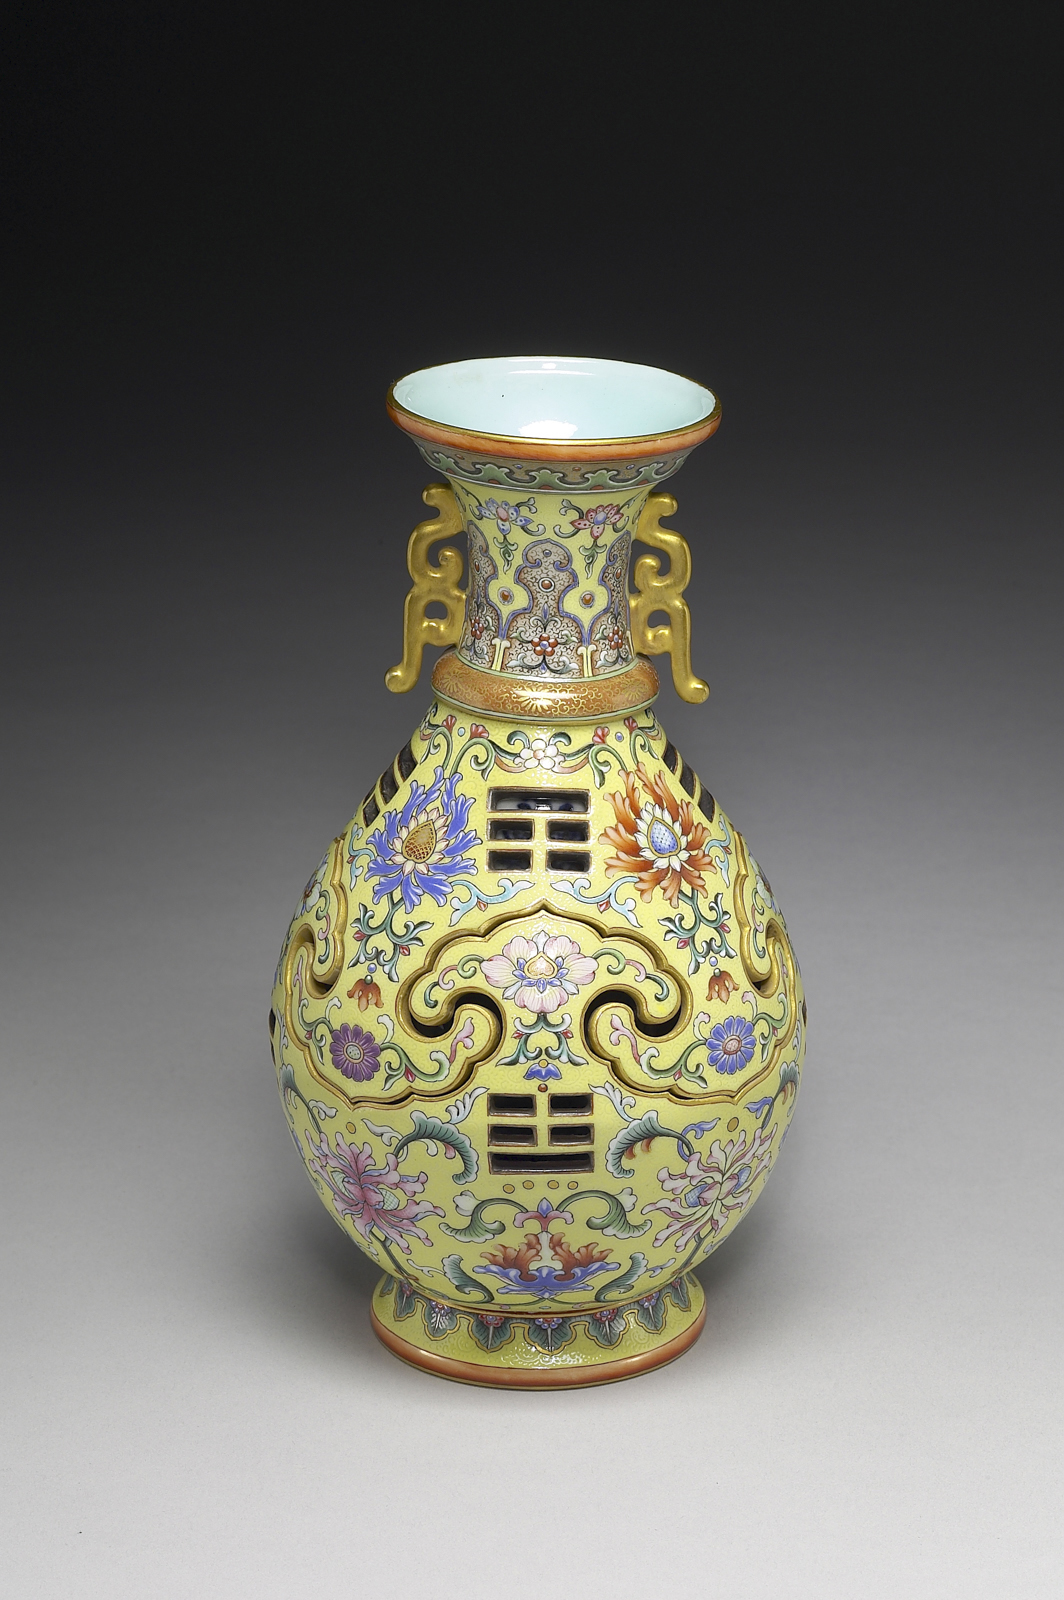 AAM Emperors' Treasures Vase with revolving core EX2016.3.106